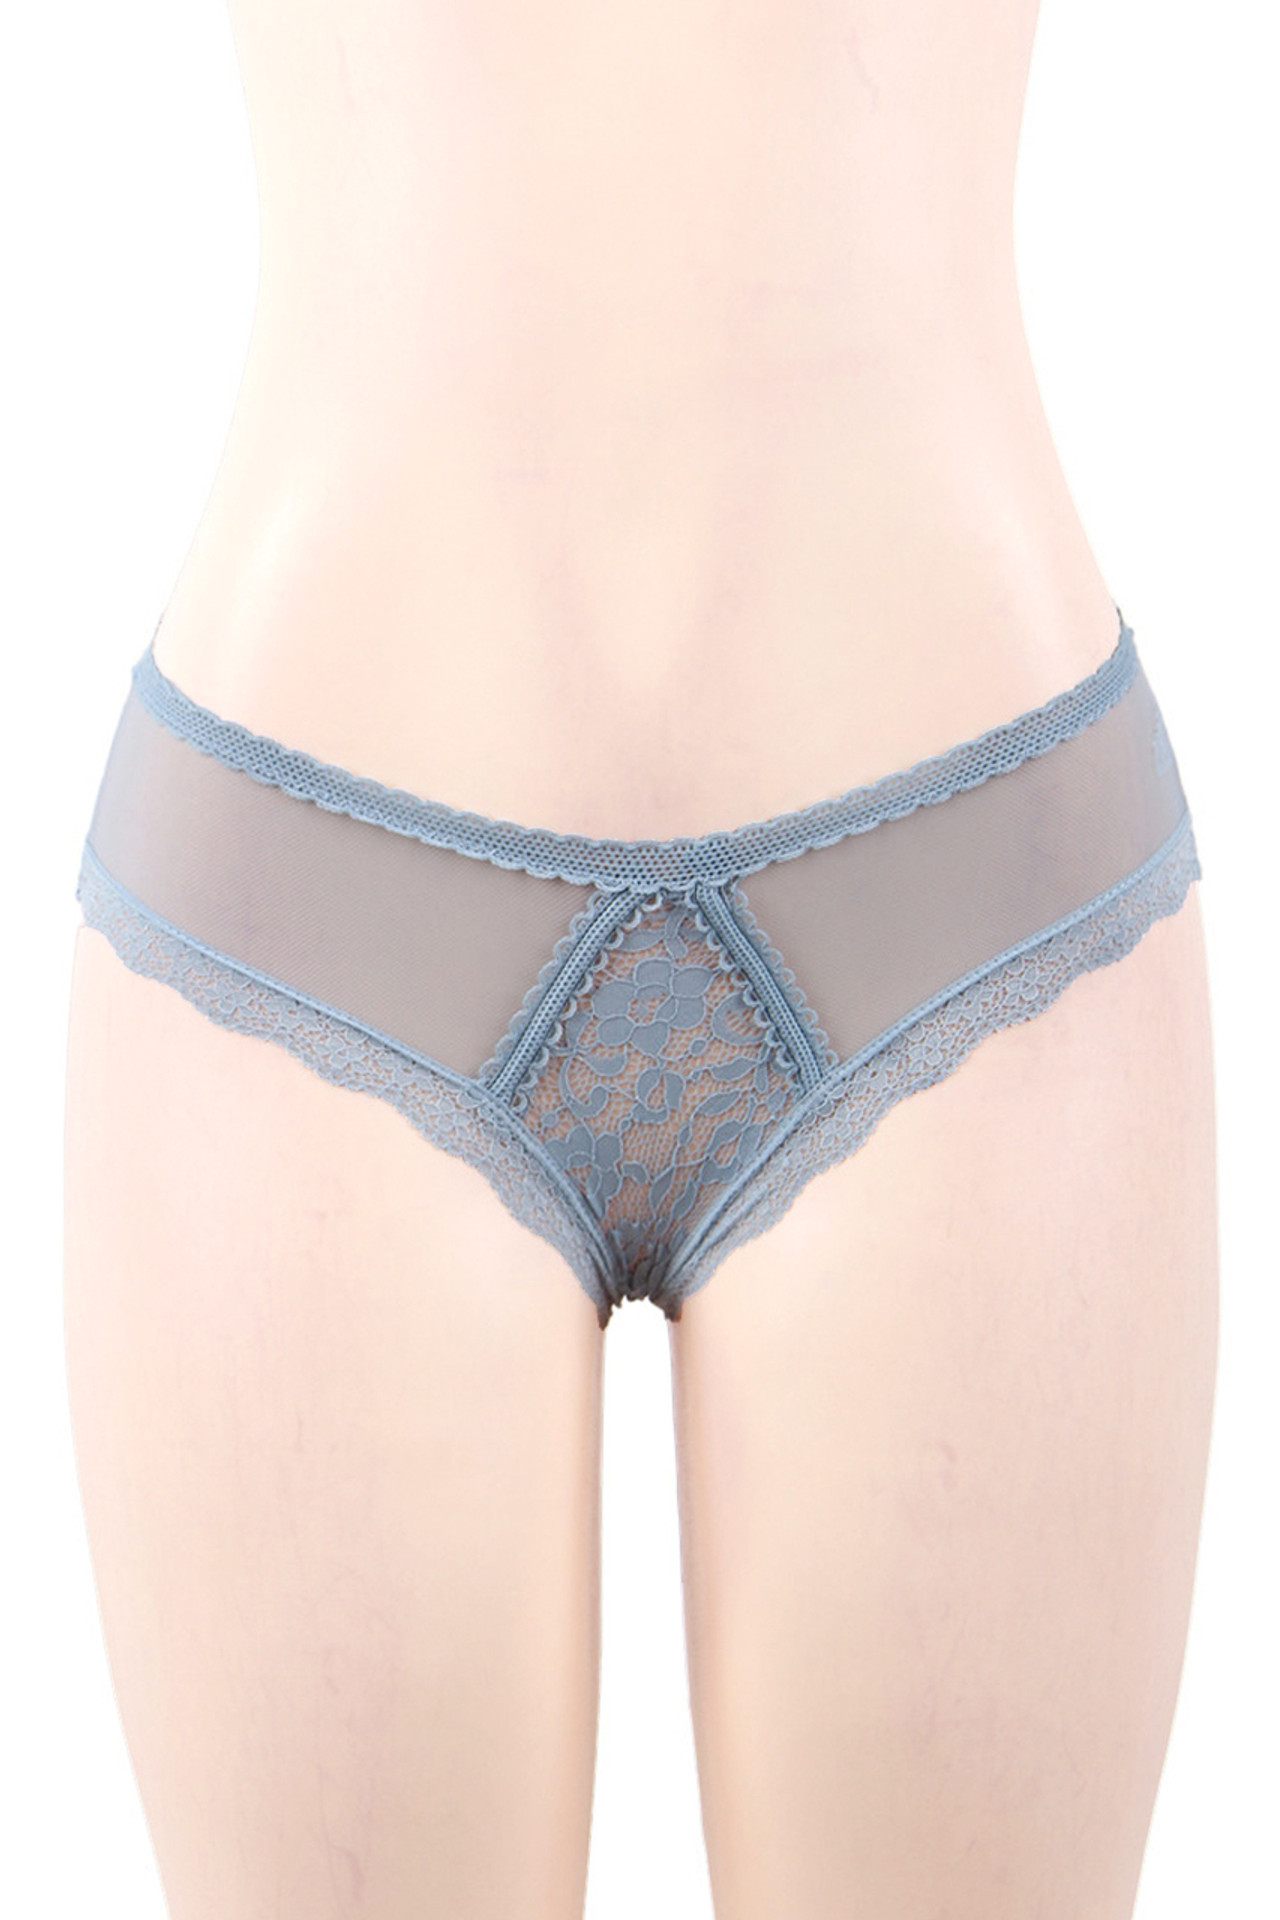 Emily Gray Blue Lace Strappy Panty